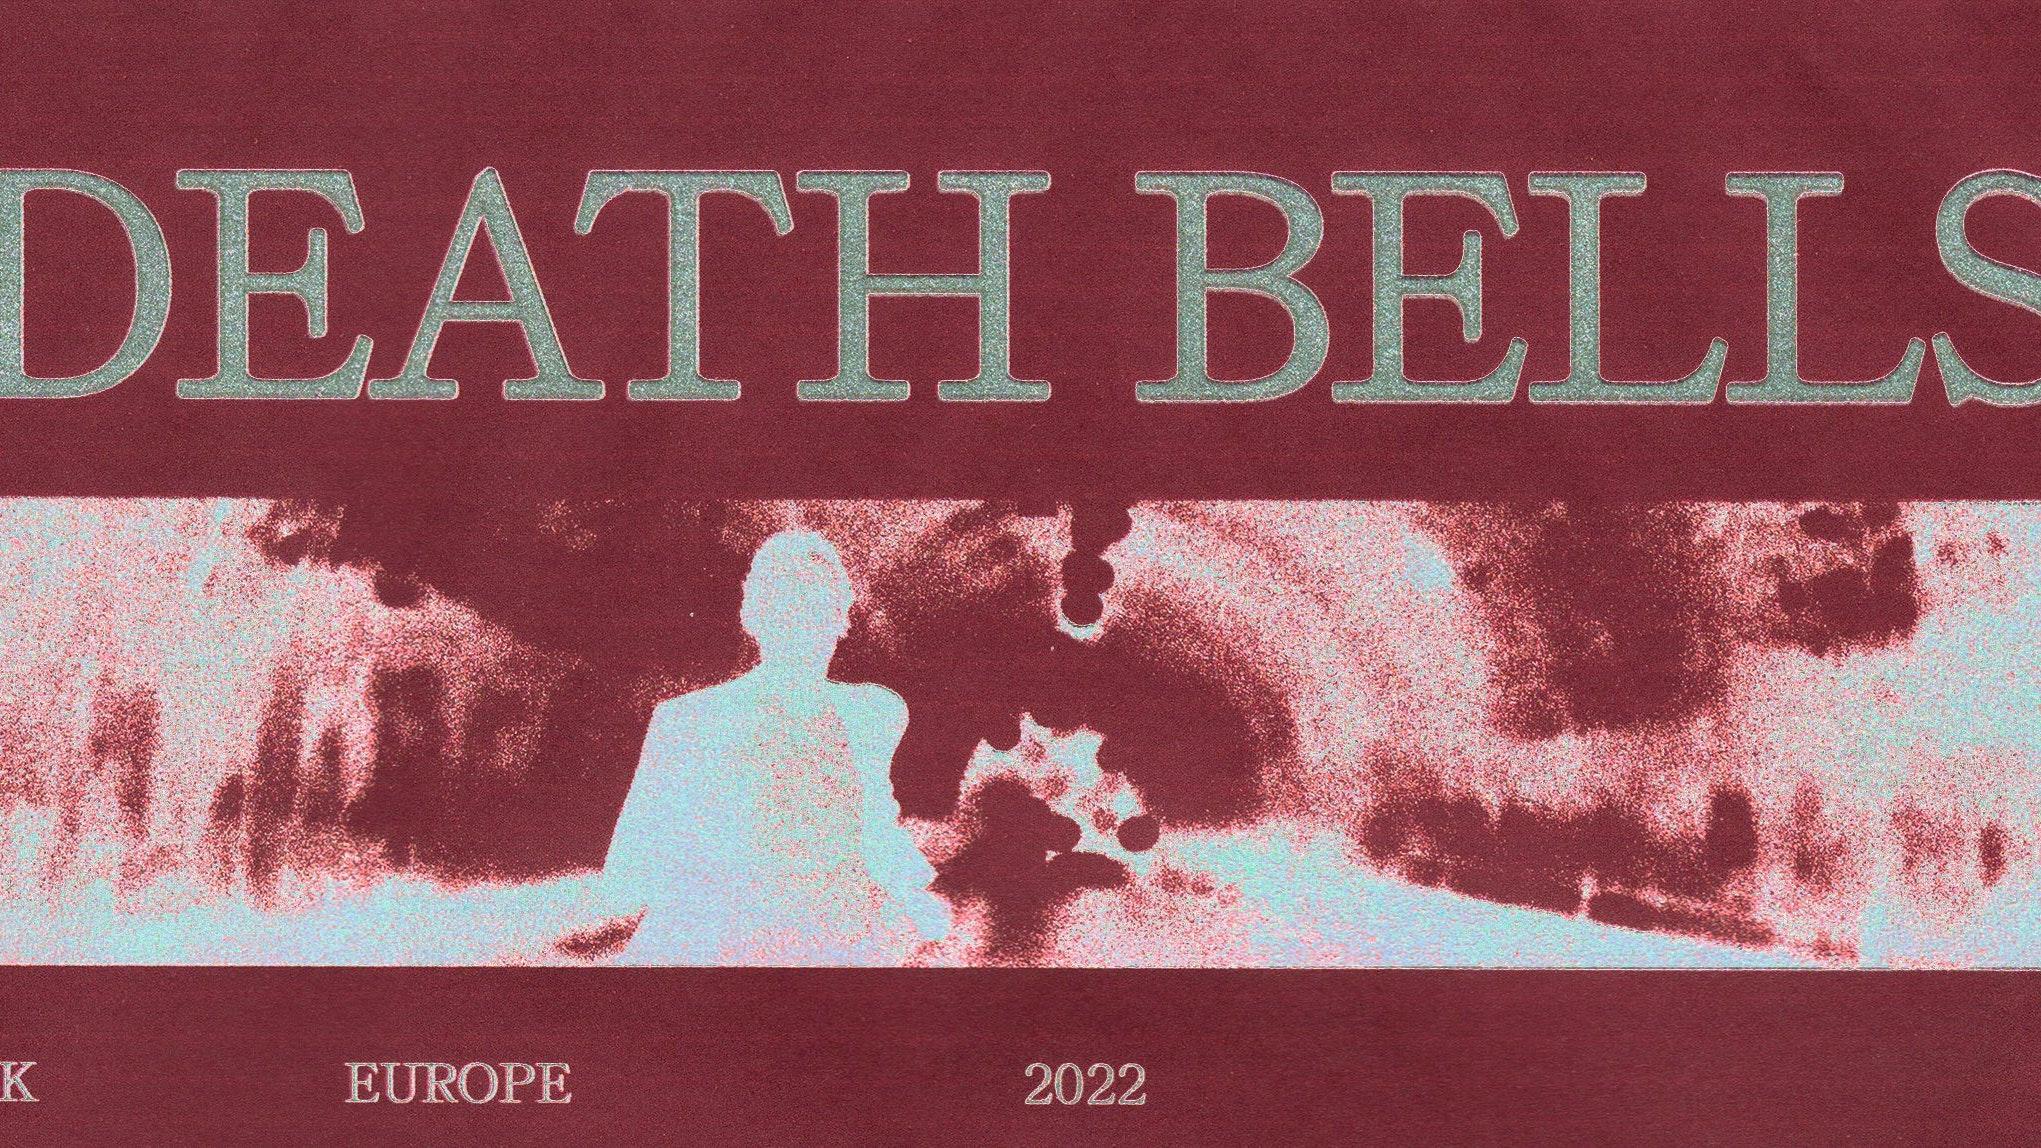 Death Bells